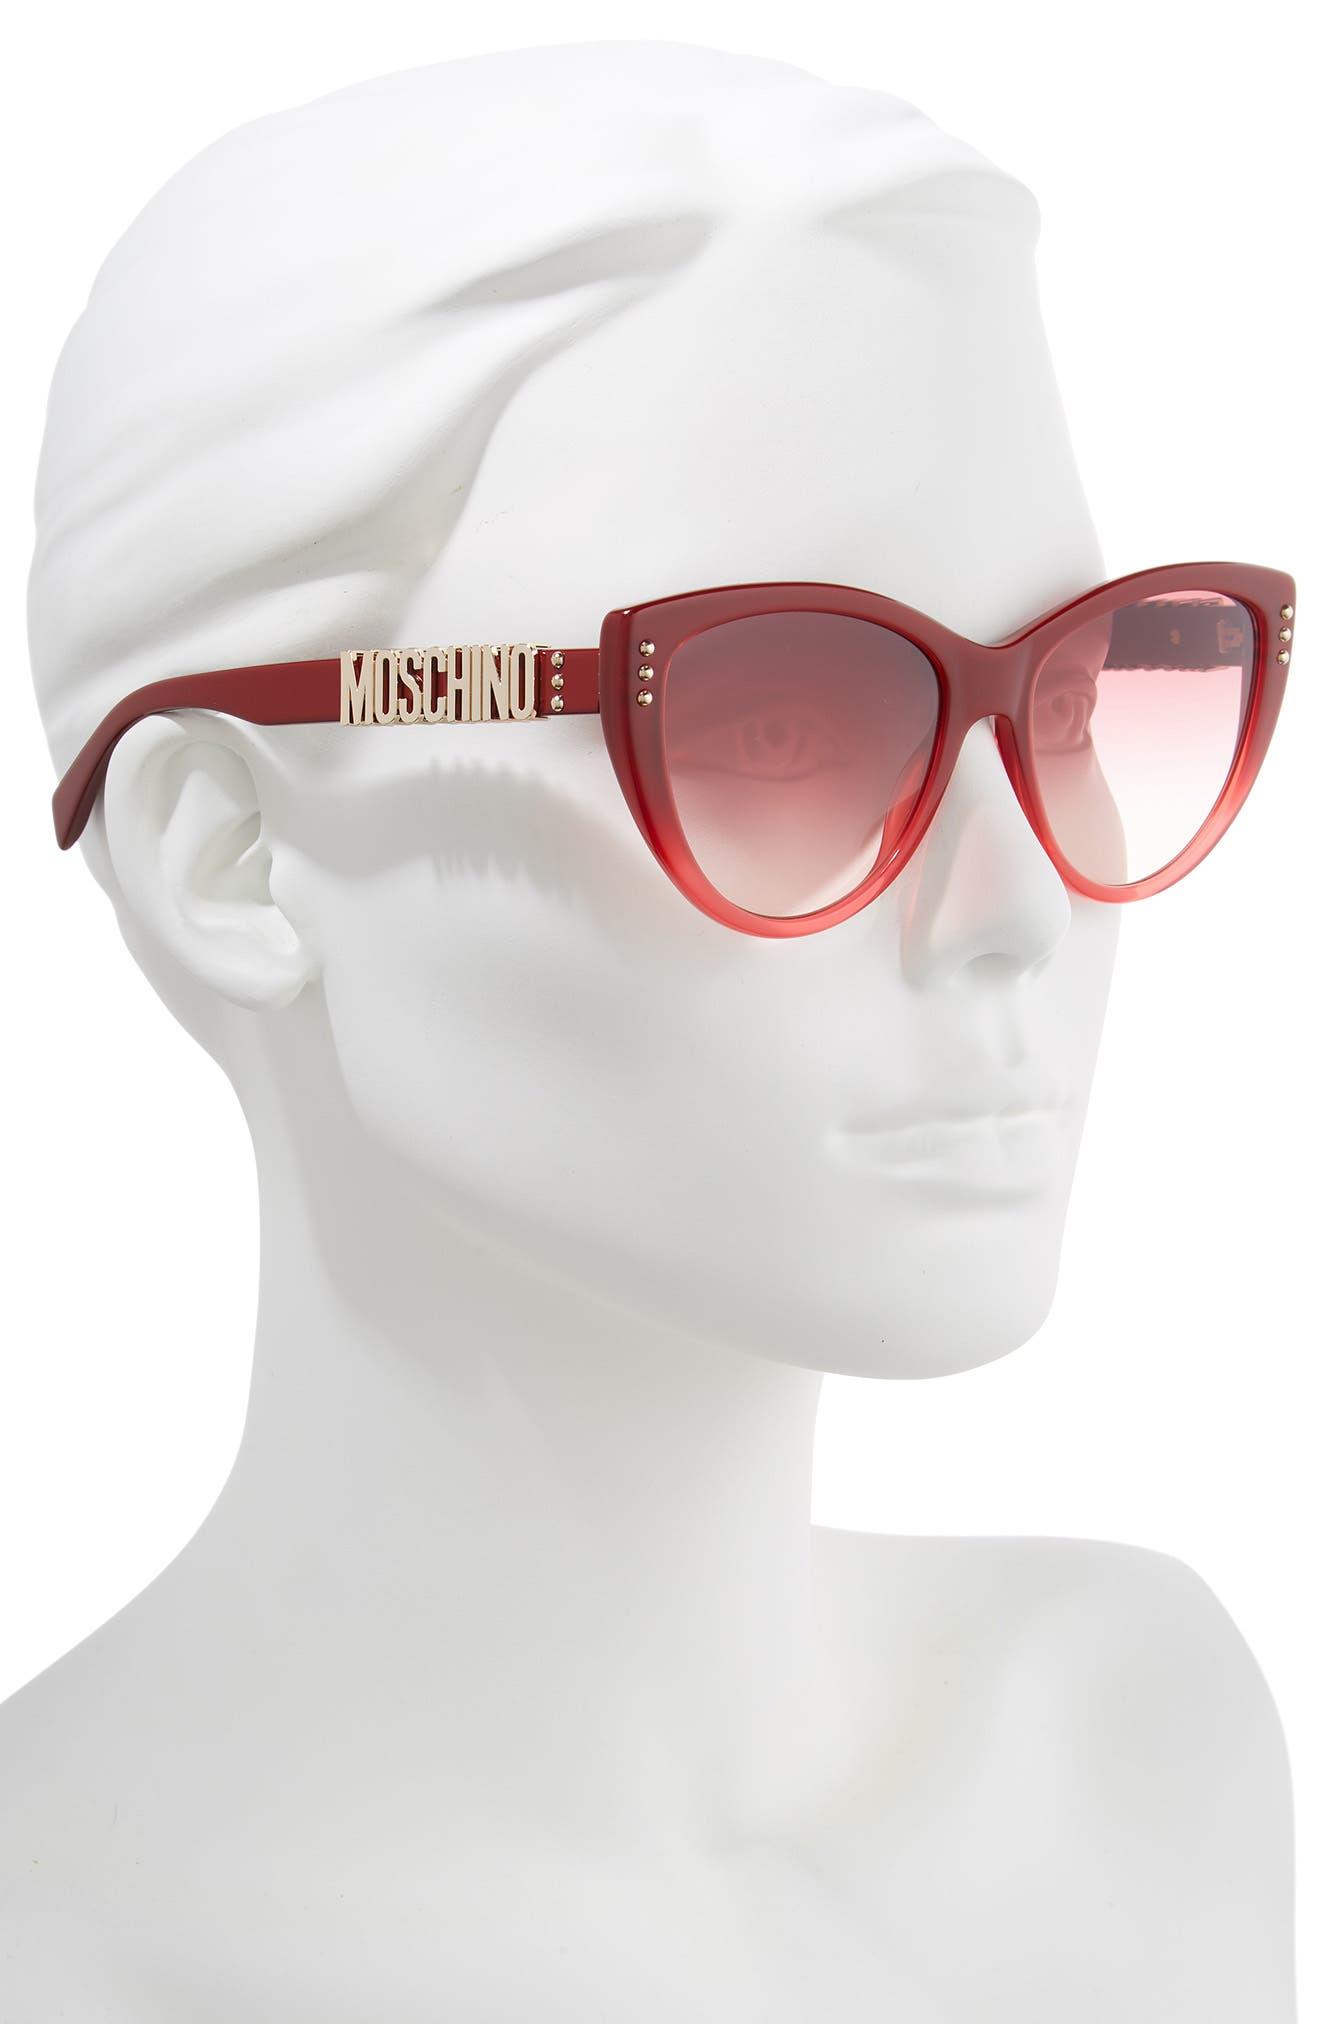 56mm Gradient Cat Eye Sunglasses,                             Alternate thumbnail 2, color,                             RED